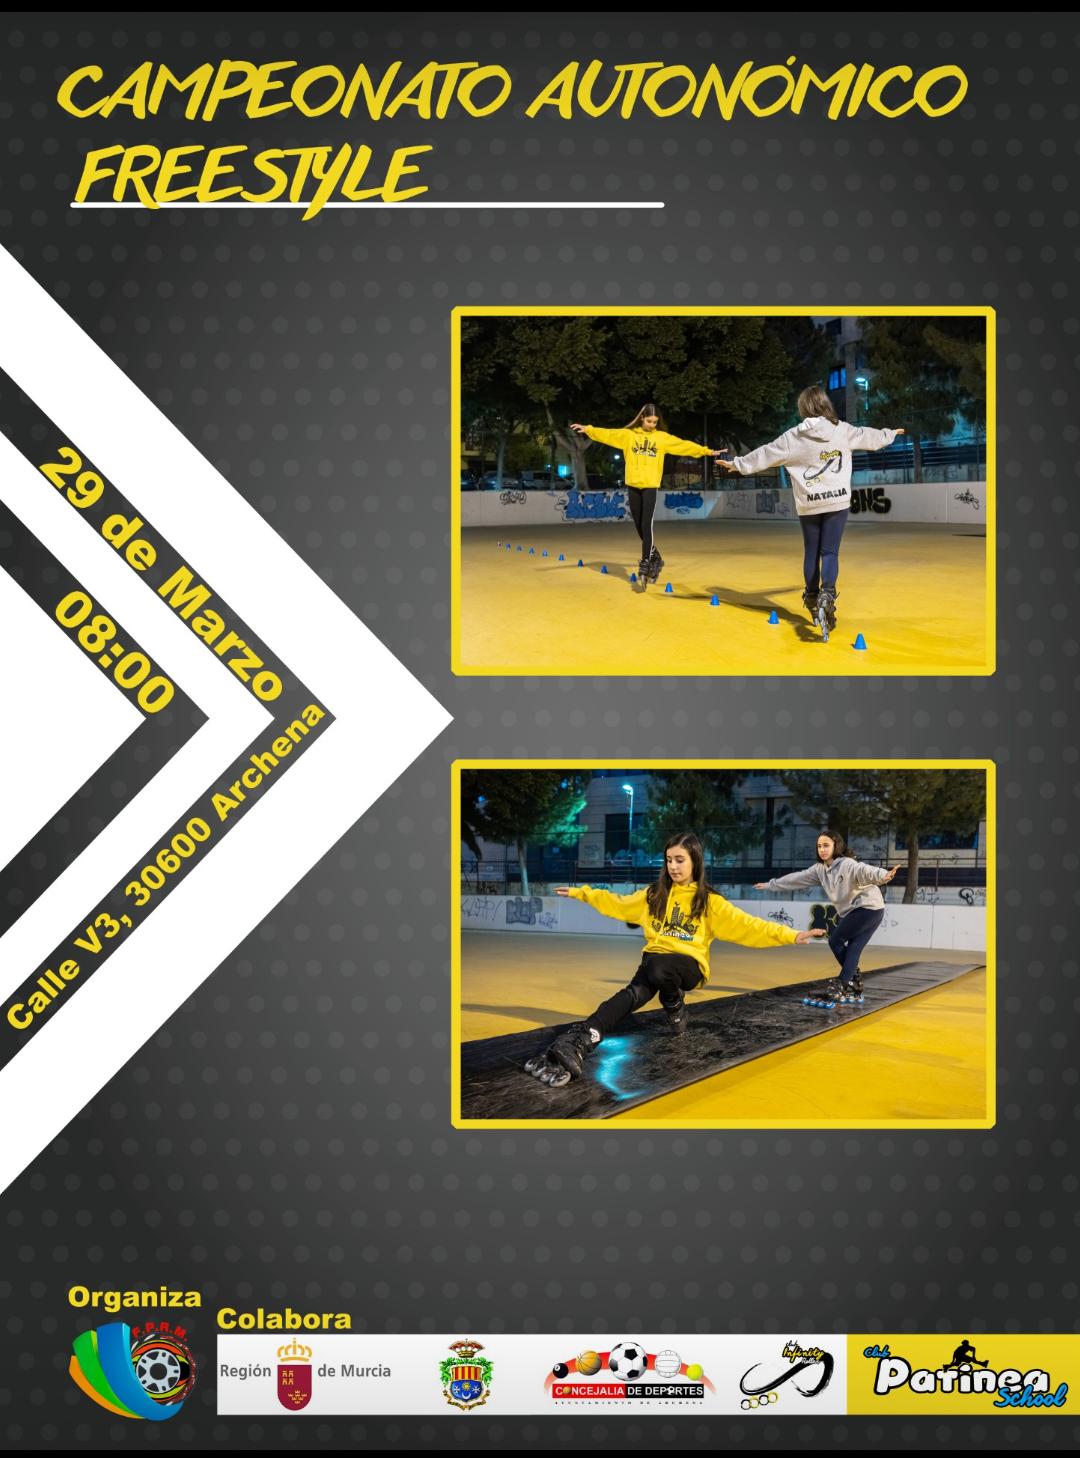 V Campeonato Automómico de Freestyle